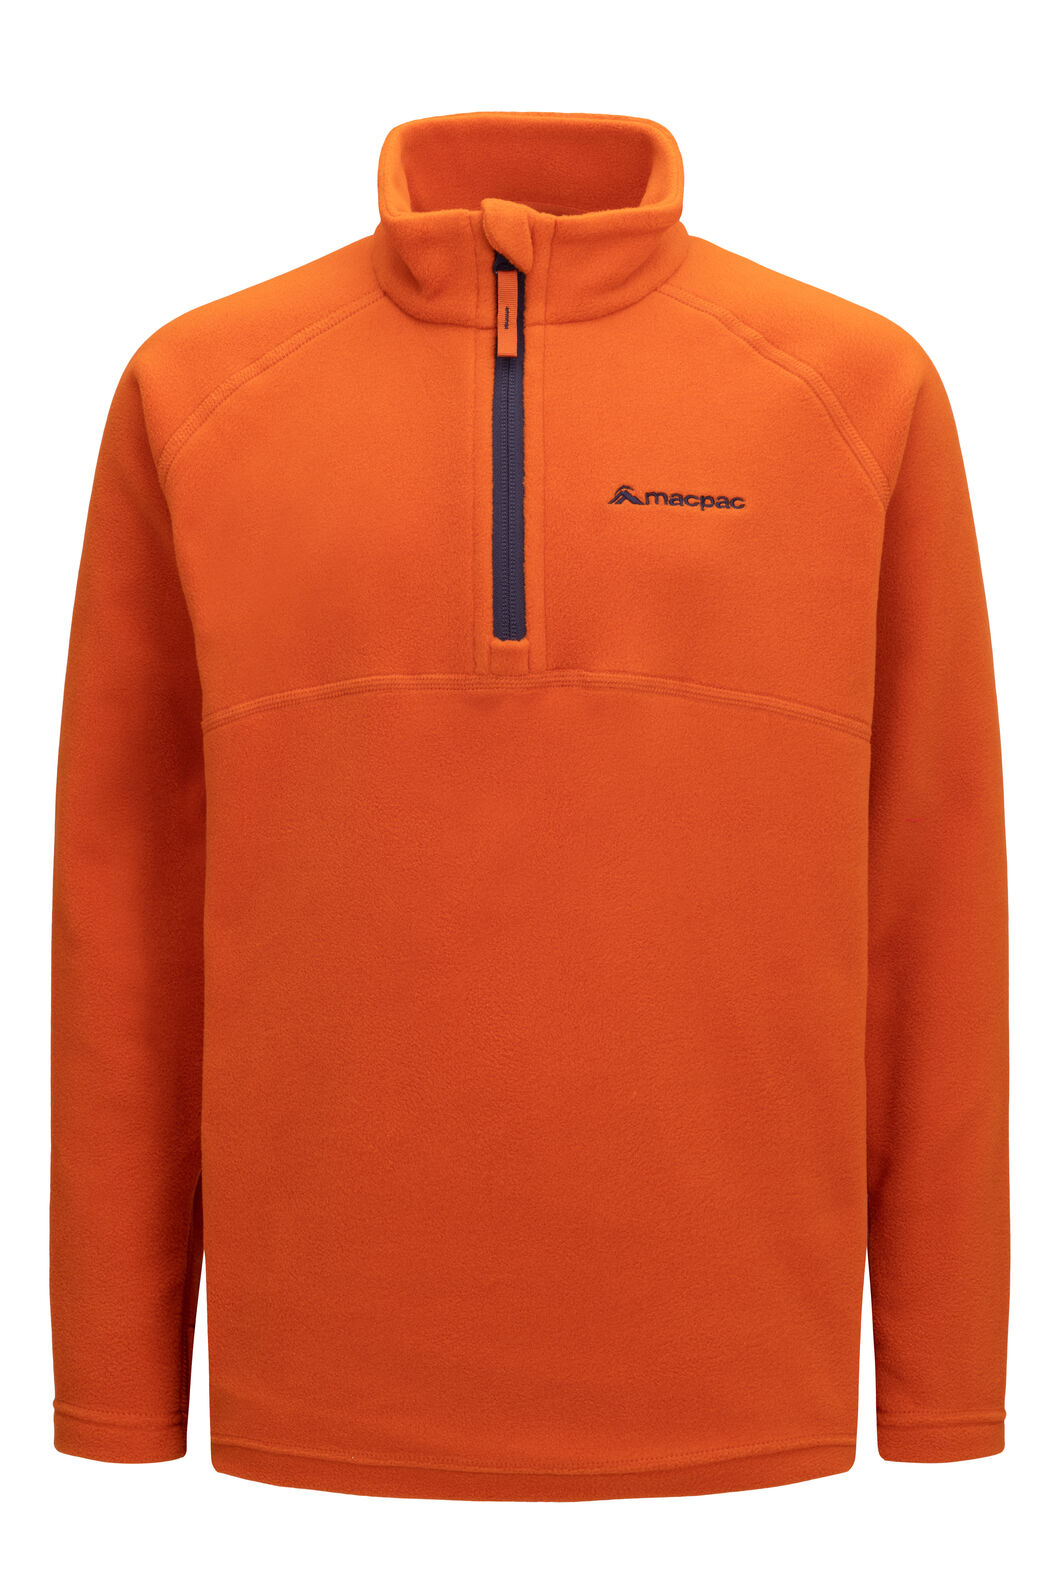 Macpac Tui Polartec® Fleece Pullover — Kids', Orange Flame, hi-res